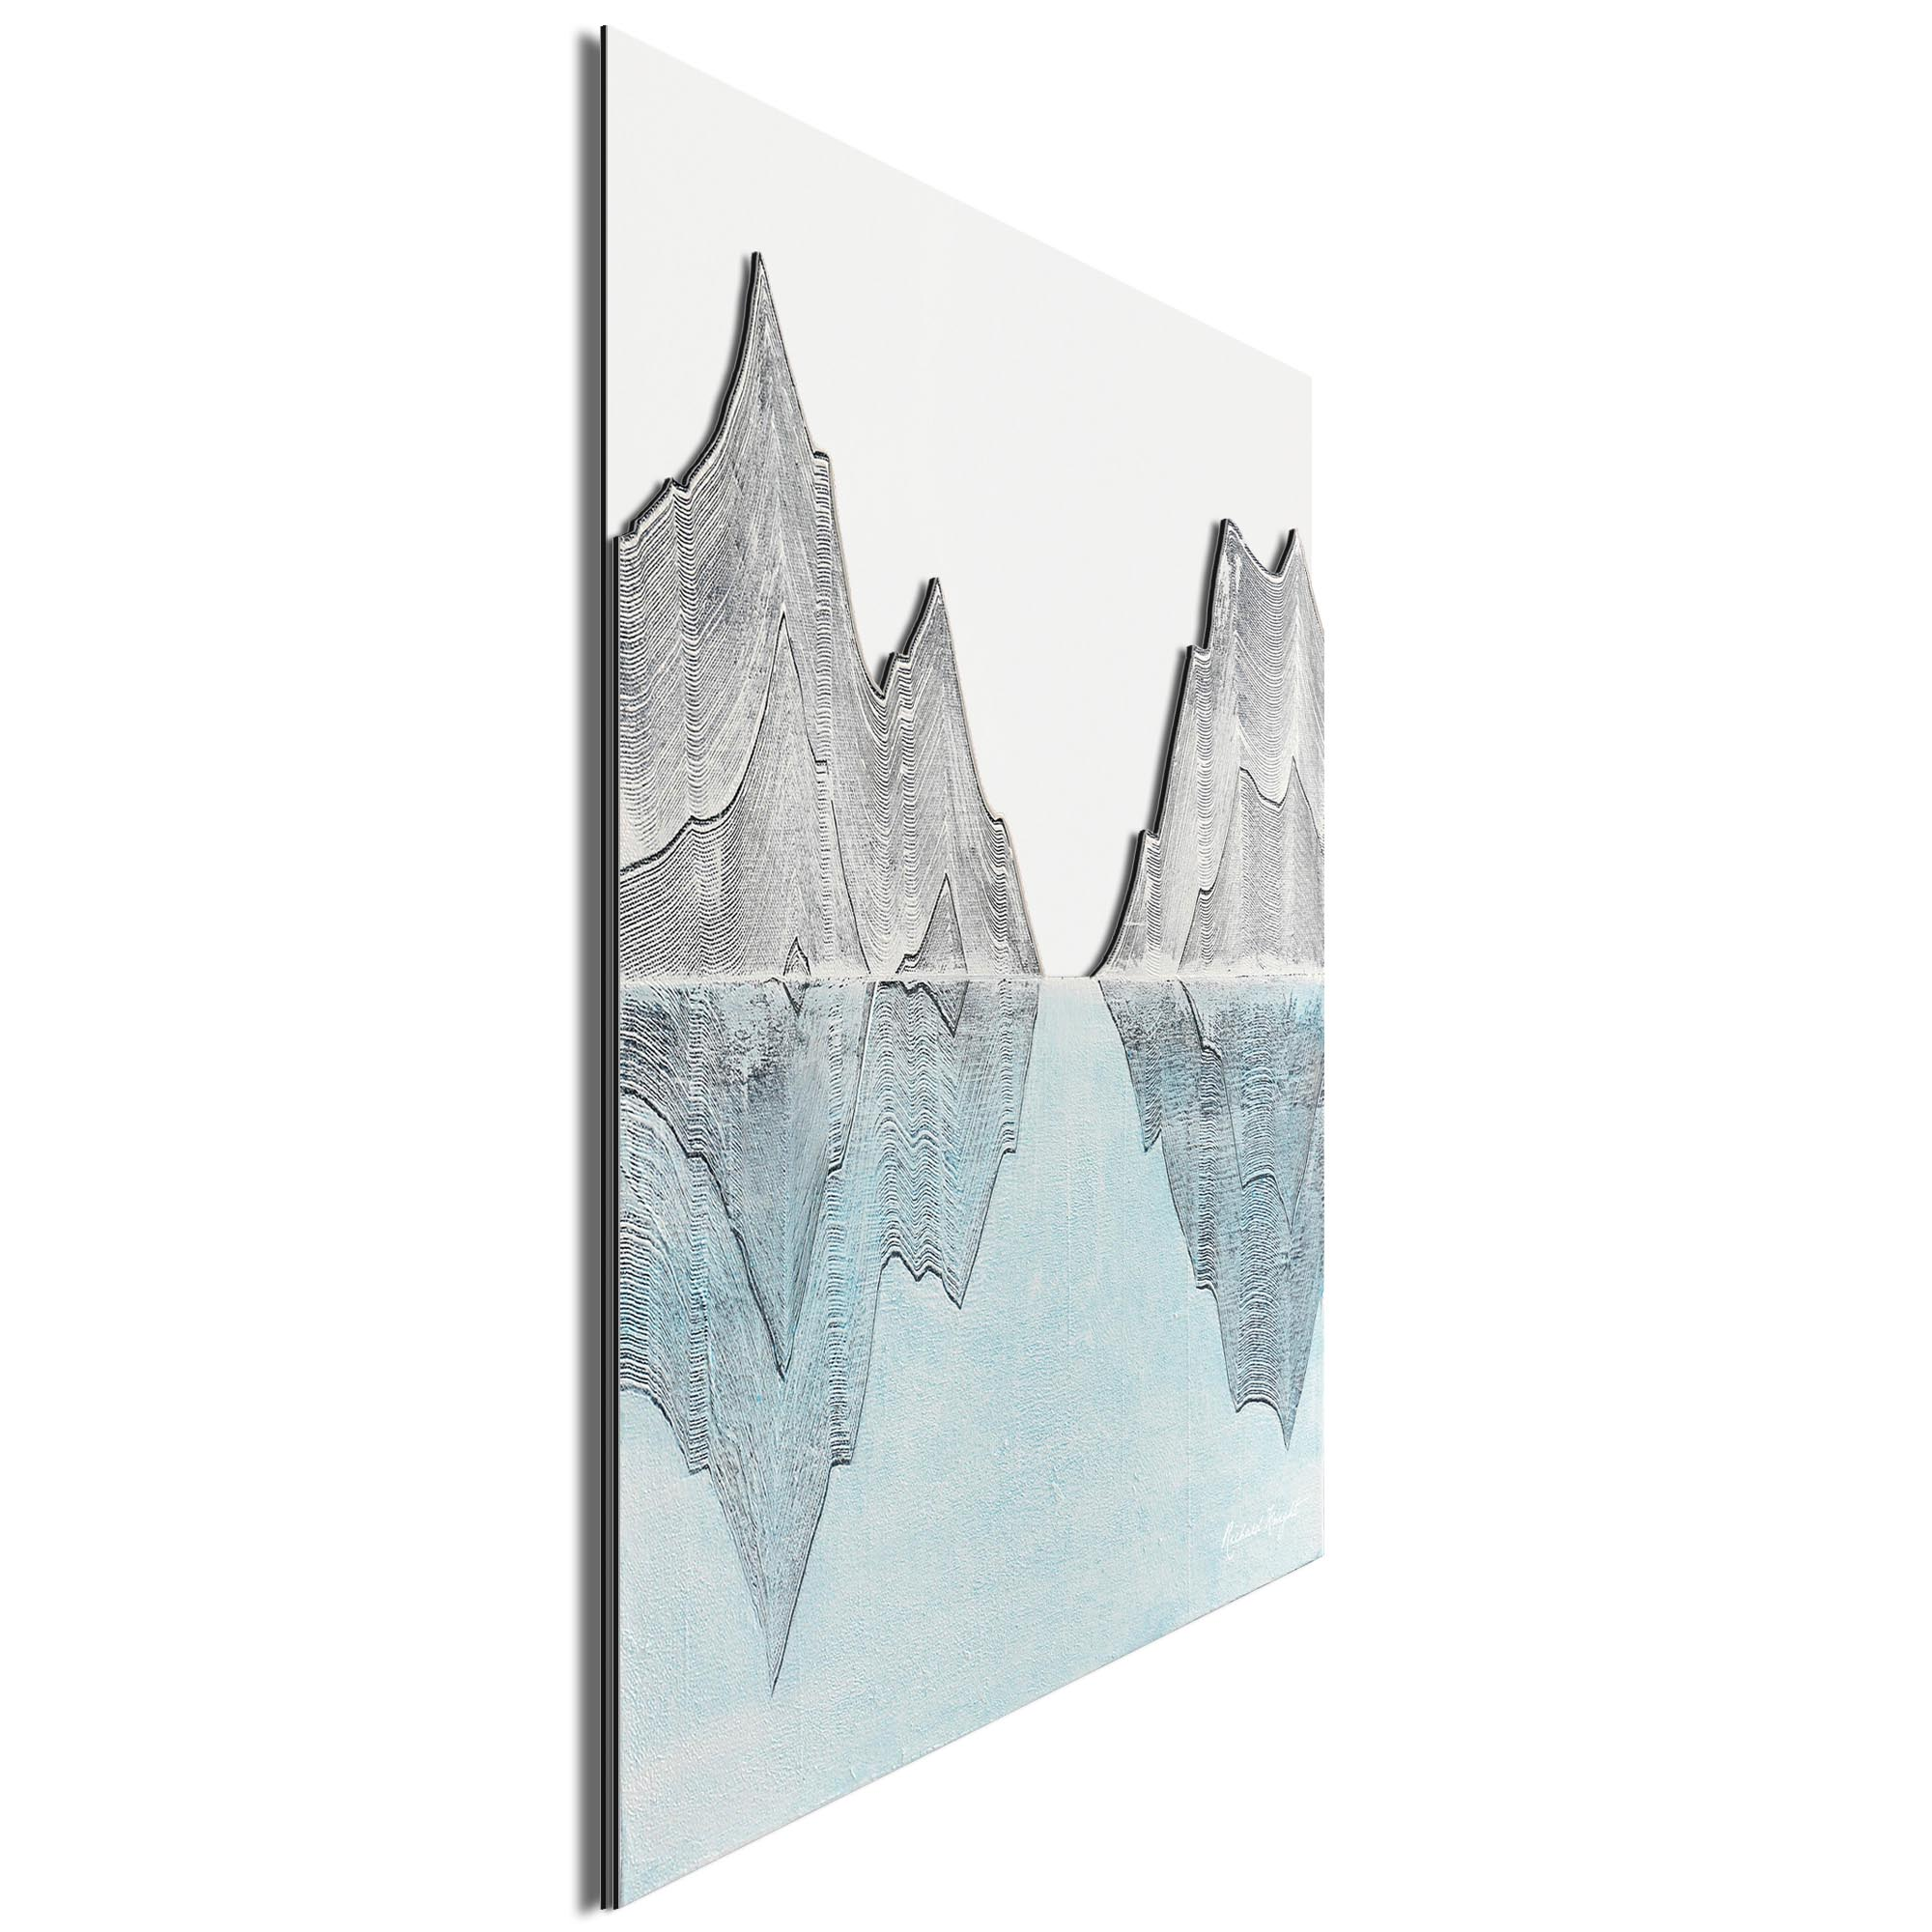 Reflection Peaks by Richard Knight - Ltd. Ed. Minimalist Abstract Landscape Art - Image 2